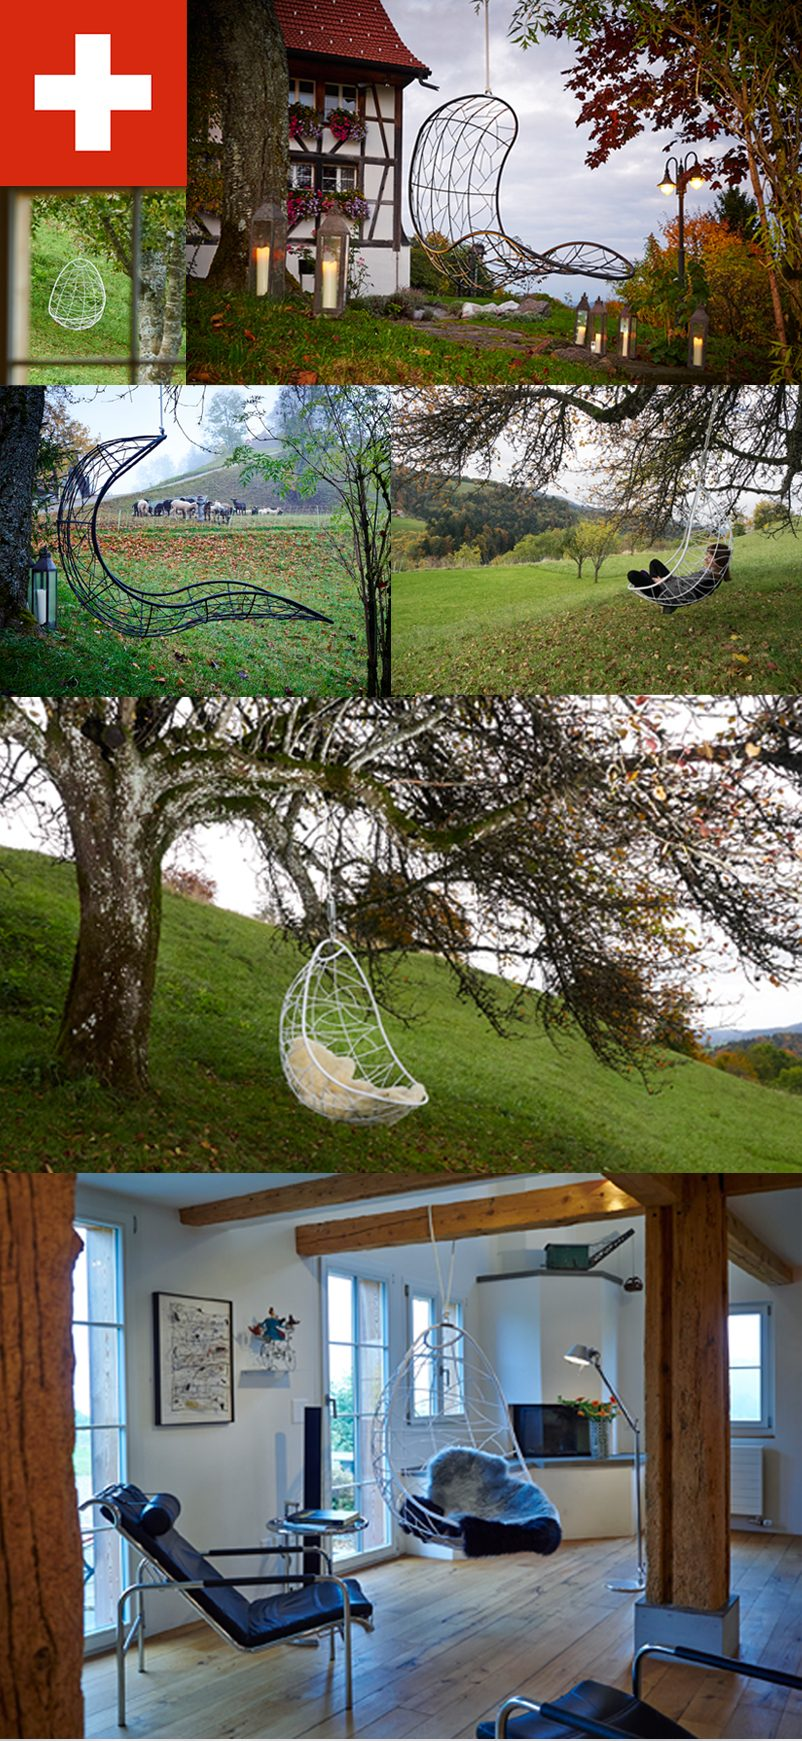 Swing Chairs in Switzerland